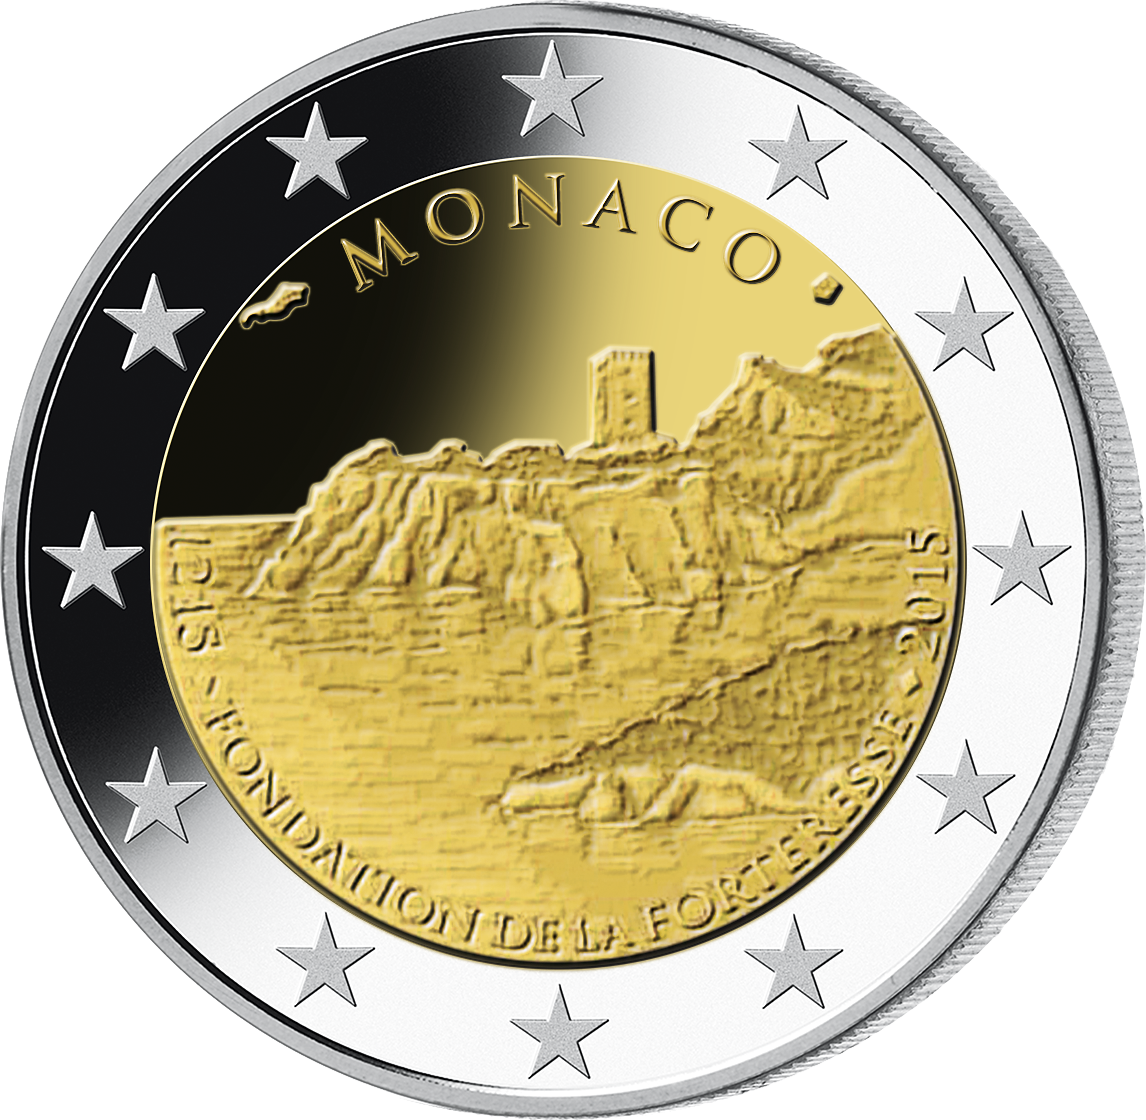 2 Euro Münze Monaco 800 Jahre Felsenschloss 2015 Pp Münzen